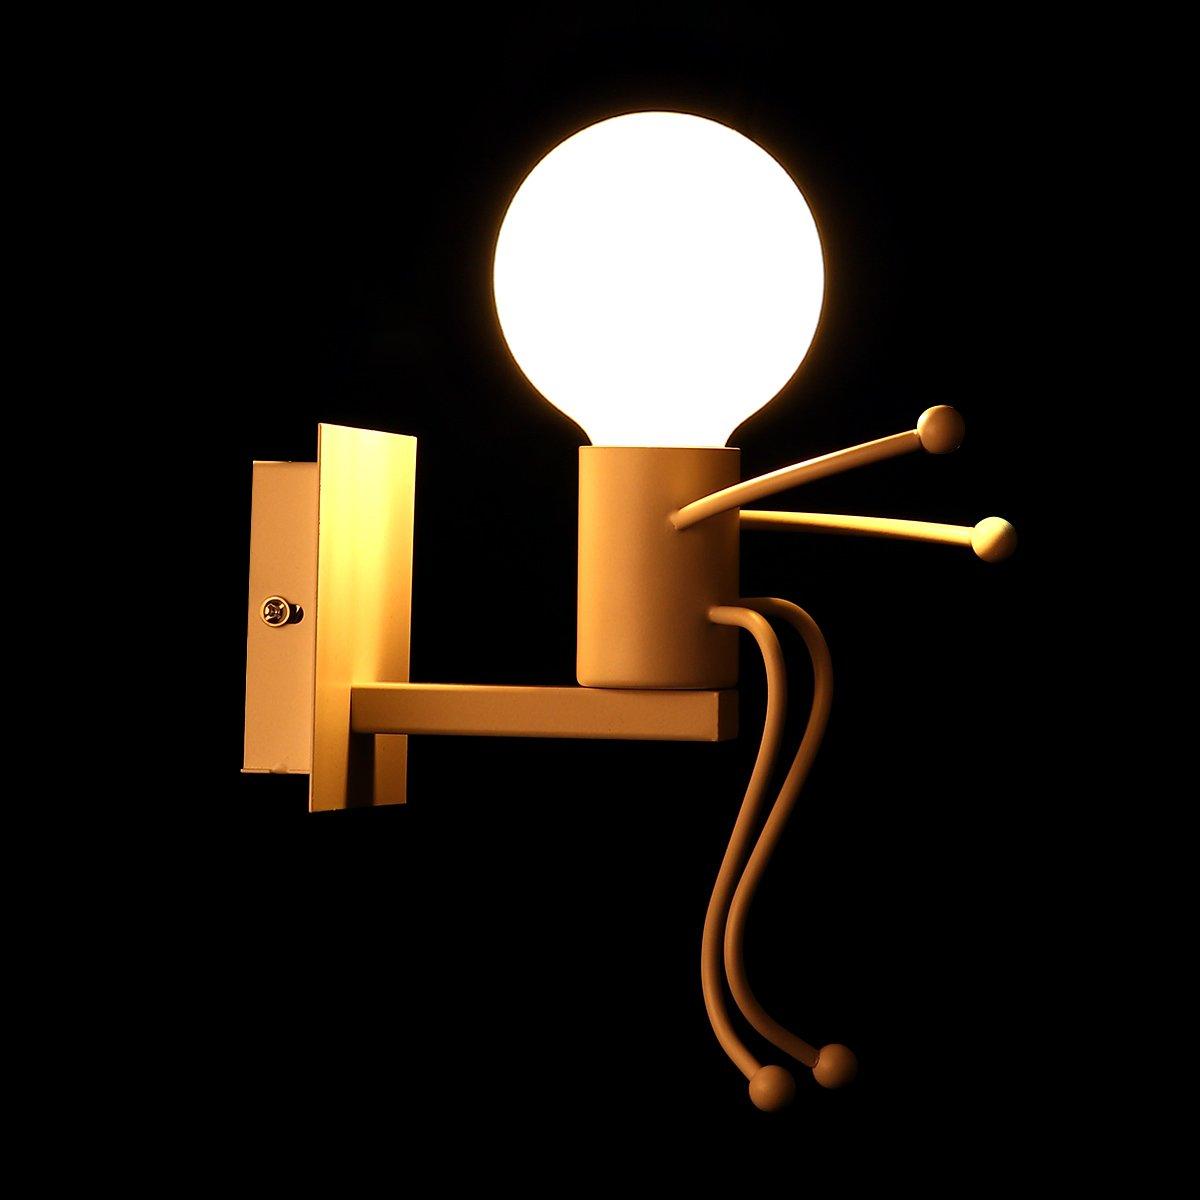 KAWELL/® Kreative Vintage Wandleuchte LED Industrie Retro Wandlampe Schwarz Eisen E27 Halter Innen Art Deco f/ür Bar Schlafzimmer Flur K/üche Caf/é Wei/ß Restaurant